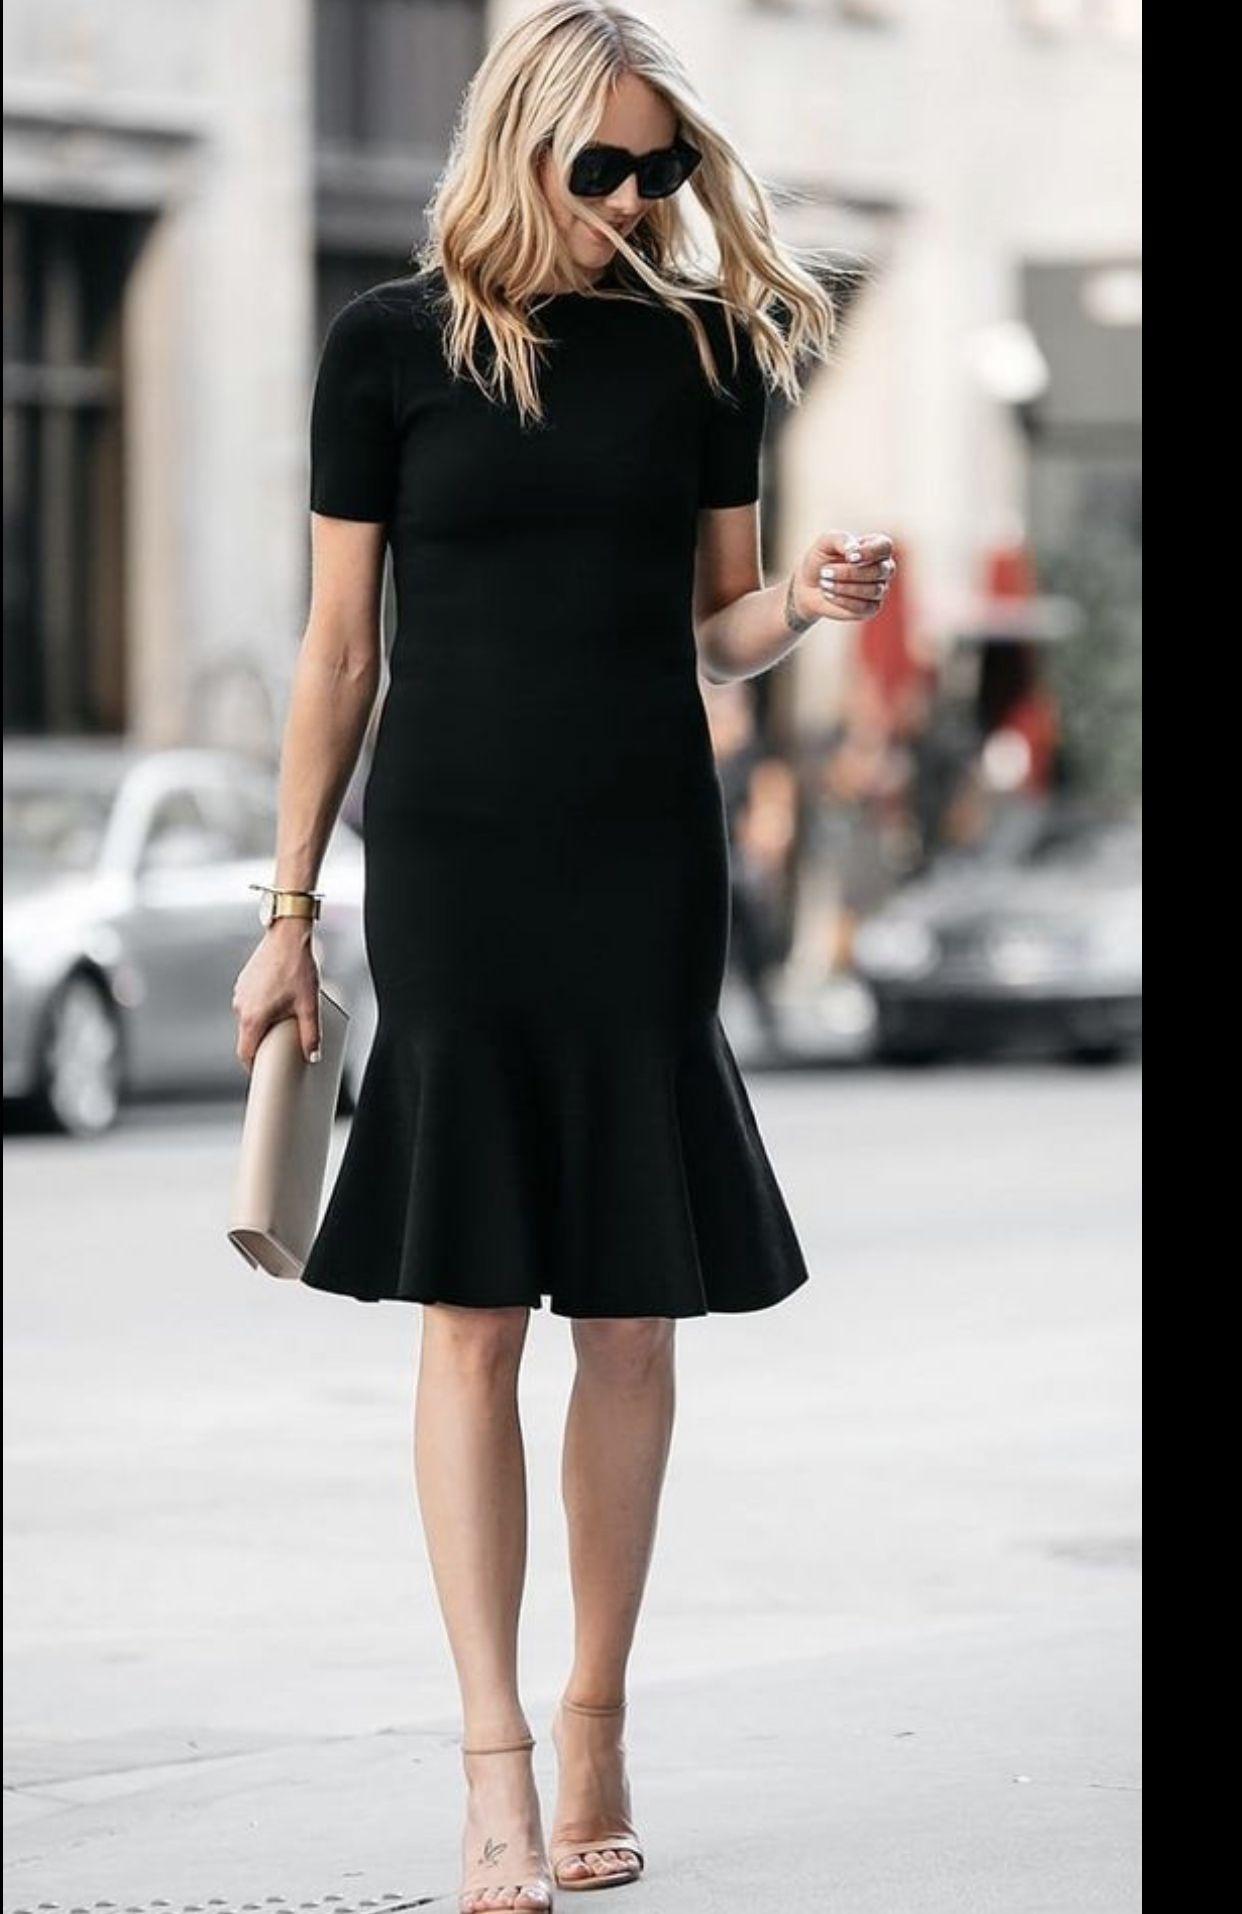 Black Dress For Funeral Juniors Review at dresses - klimafup